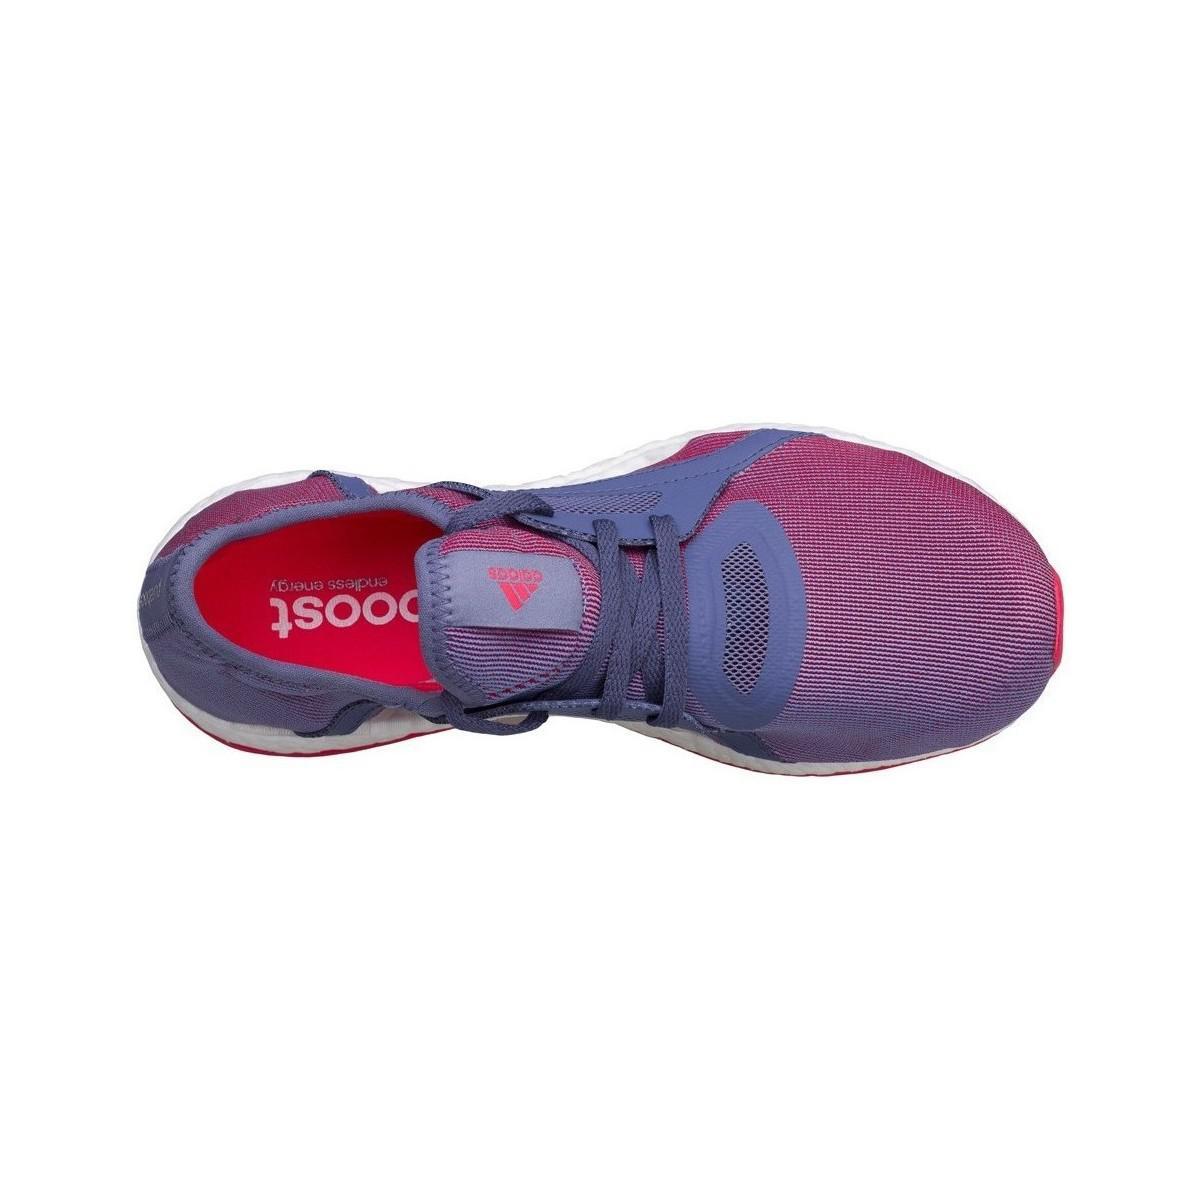 adidas Pureboost X Women's Running Trainers In Pink